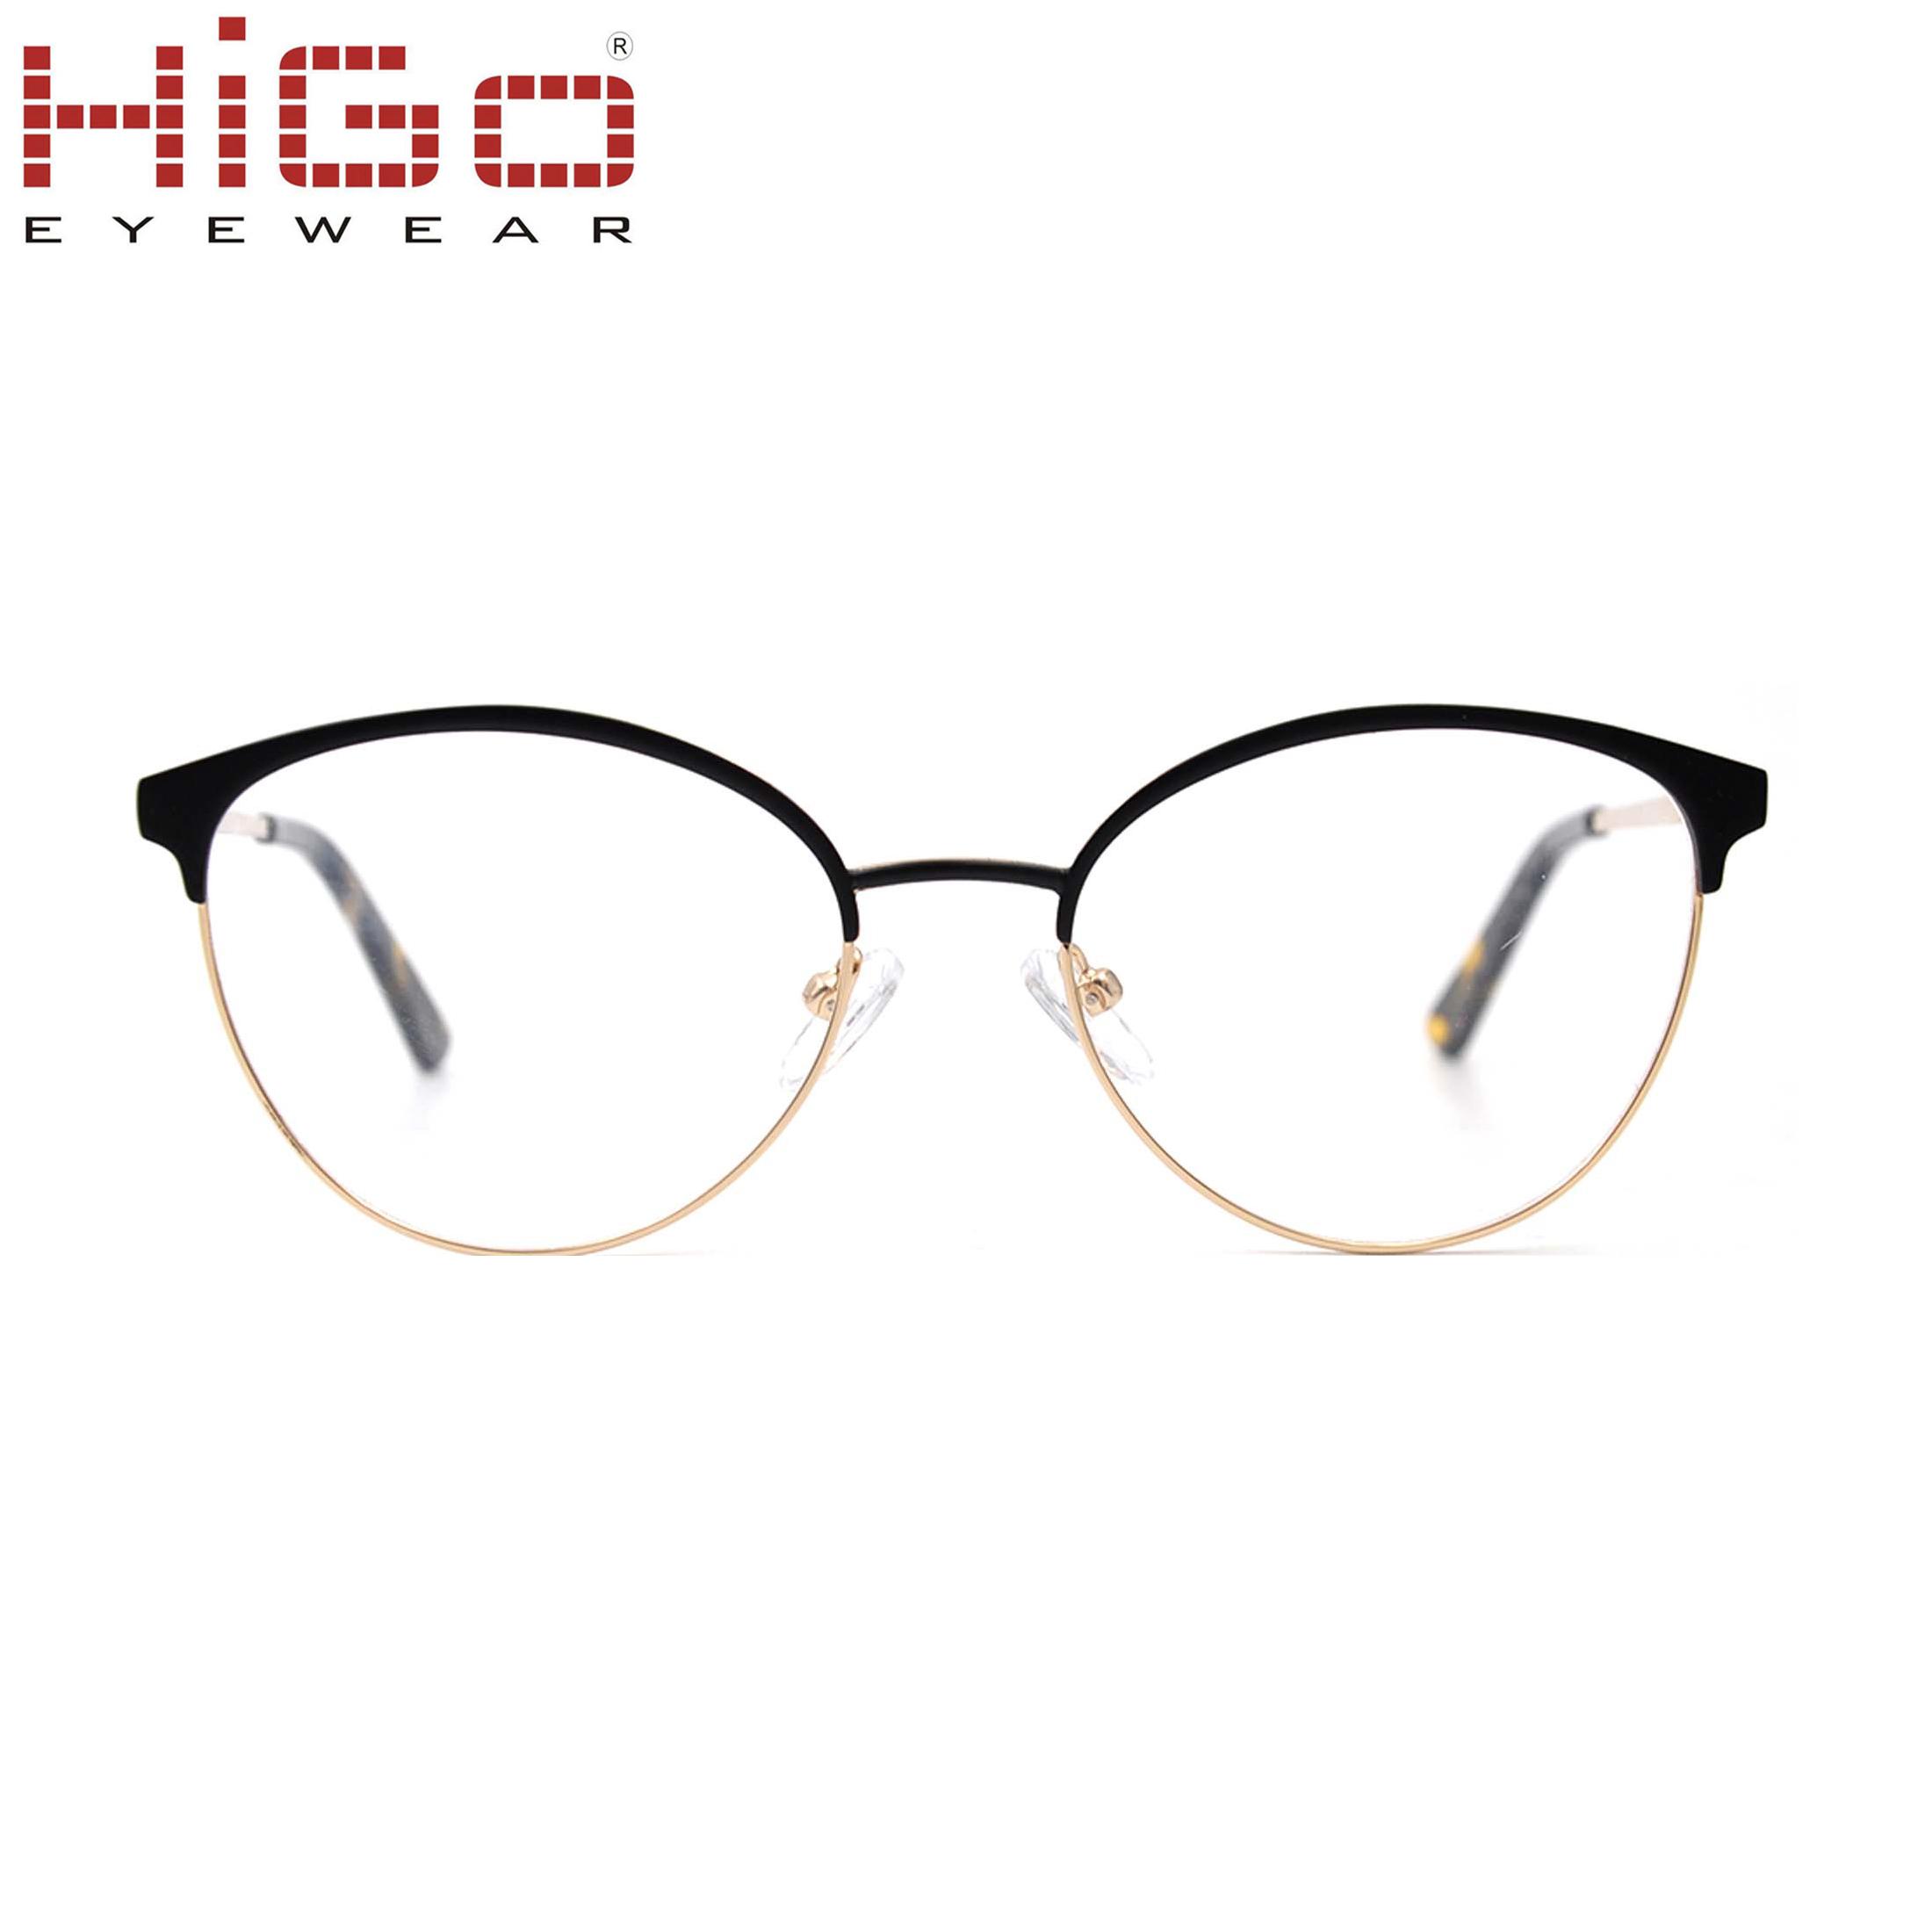 73067696a2e2 China spectacle optical materials wholesale 🇨🇳 - Alibaba